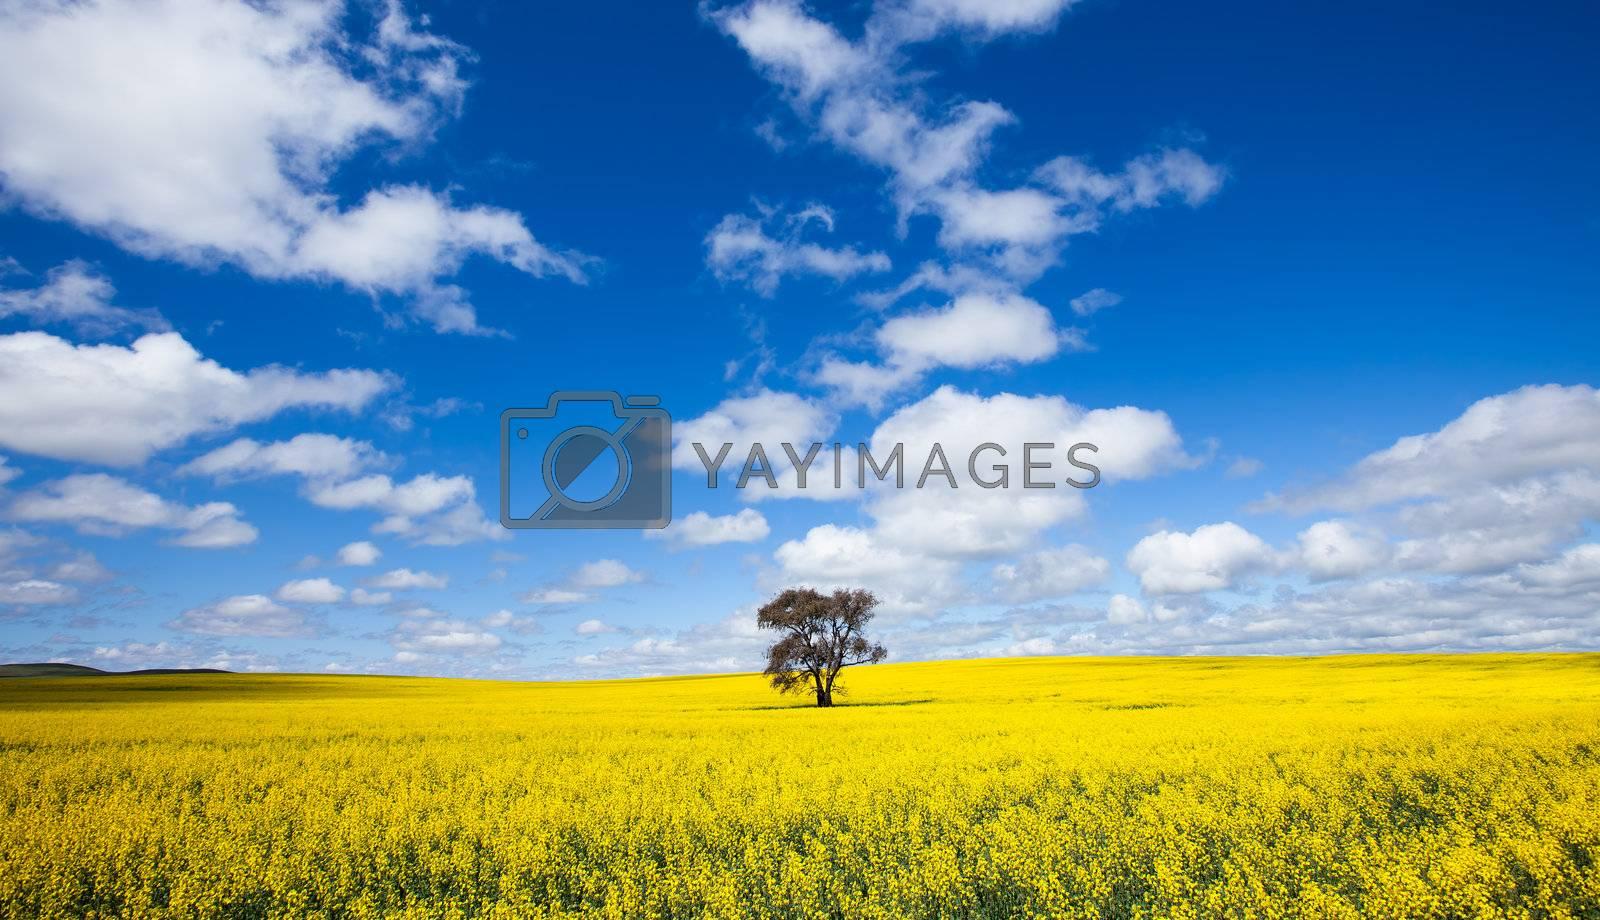 Single tree in Canola Field - Clare Valley, South Australia